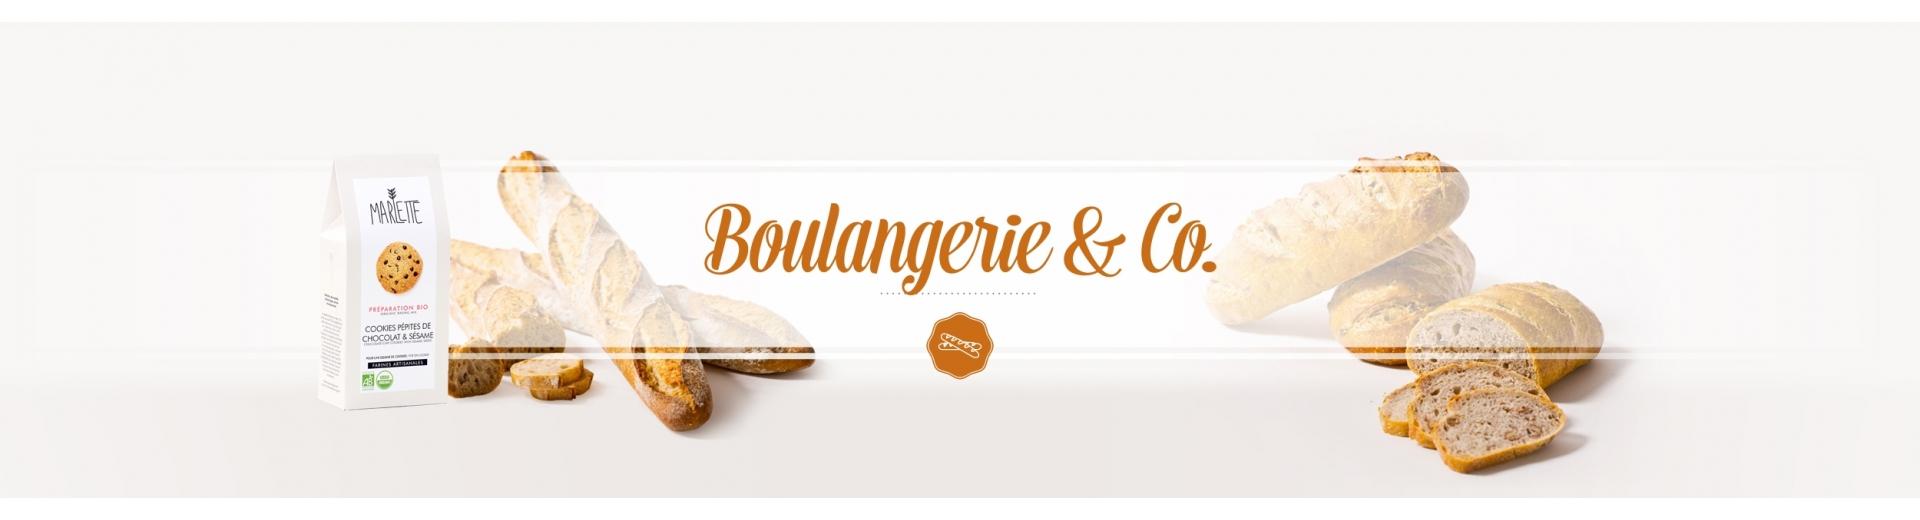 Boulangerie et Co